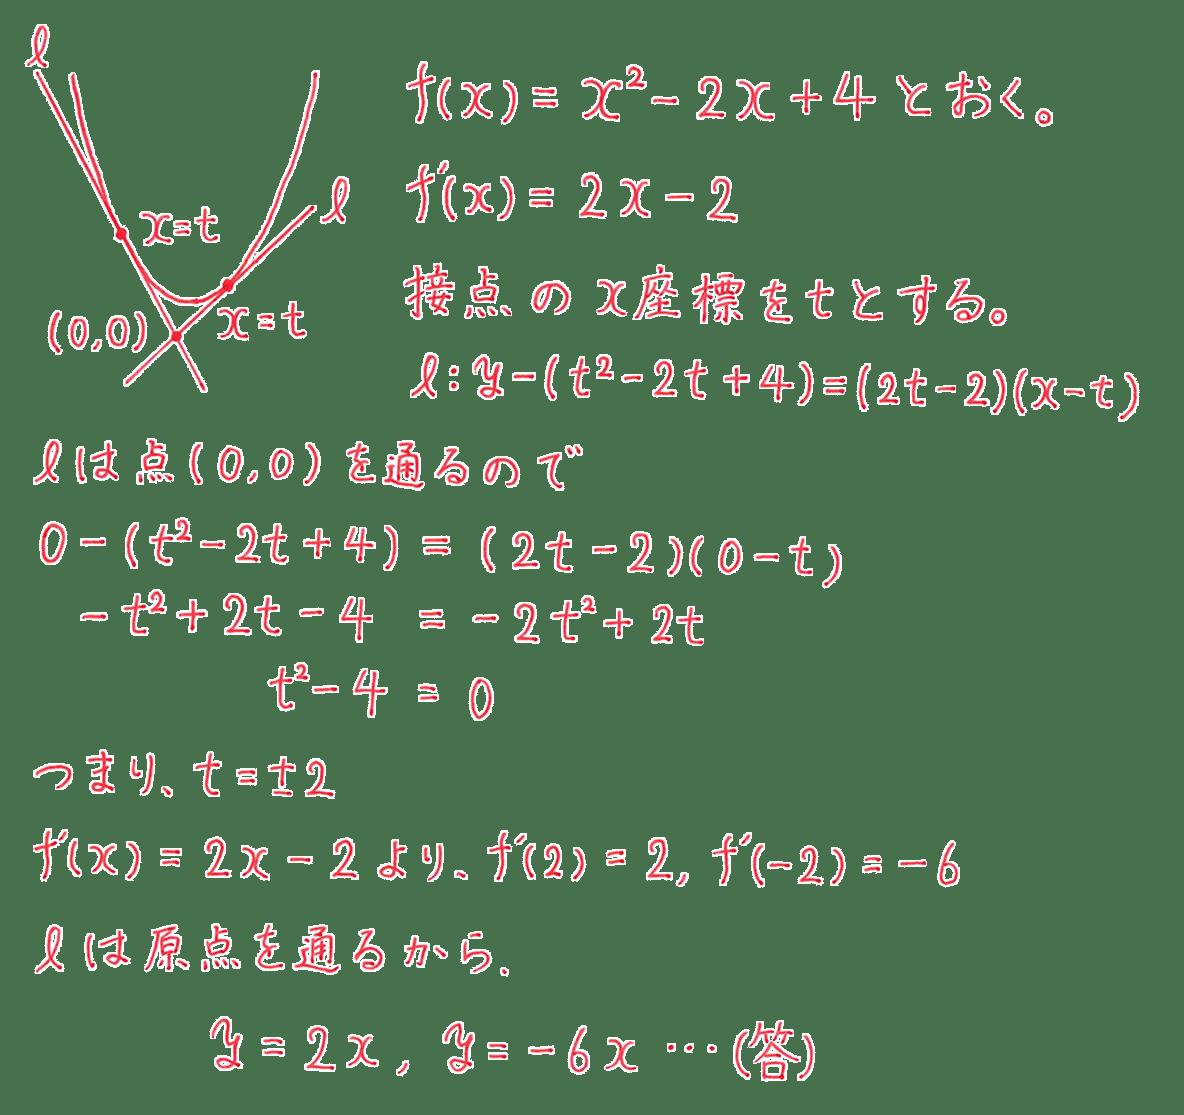 高校数学Ⅱ 微分法と積分法10 練習 答え